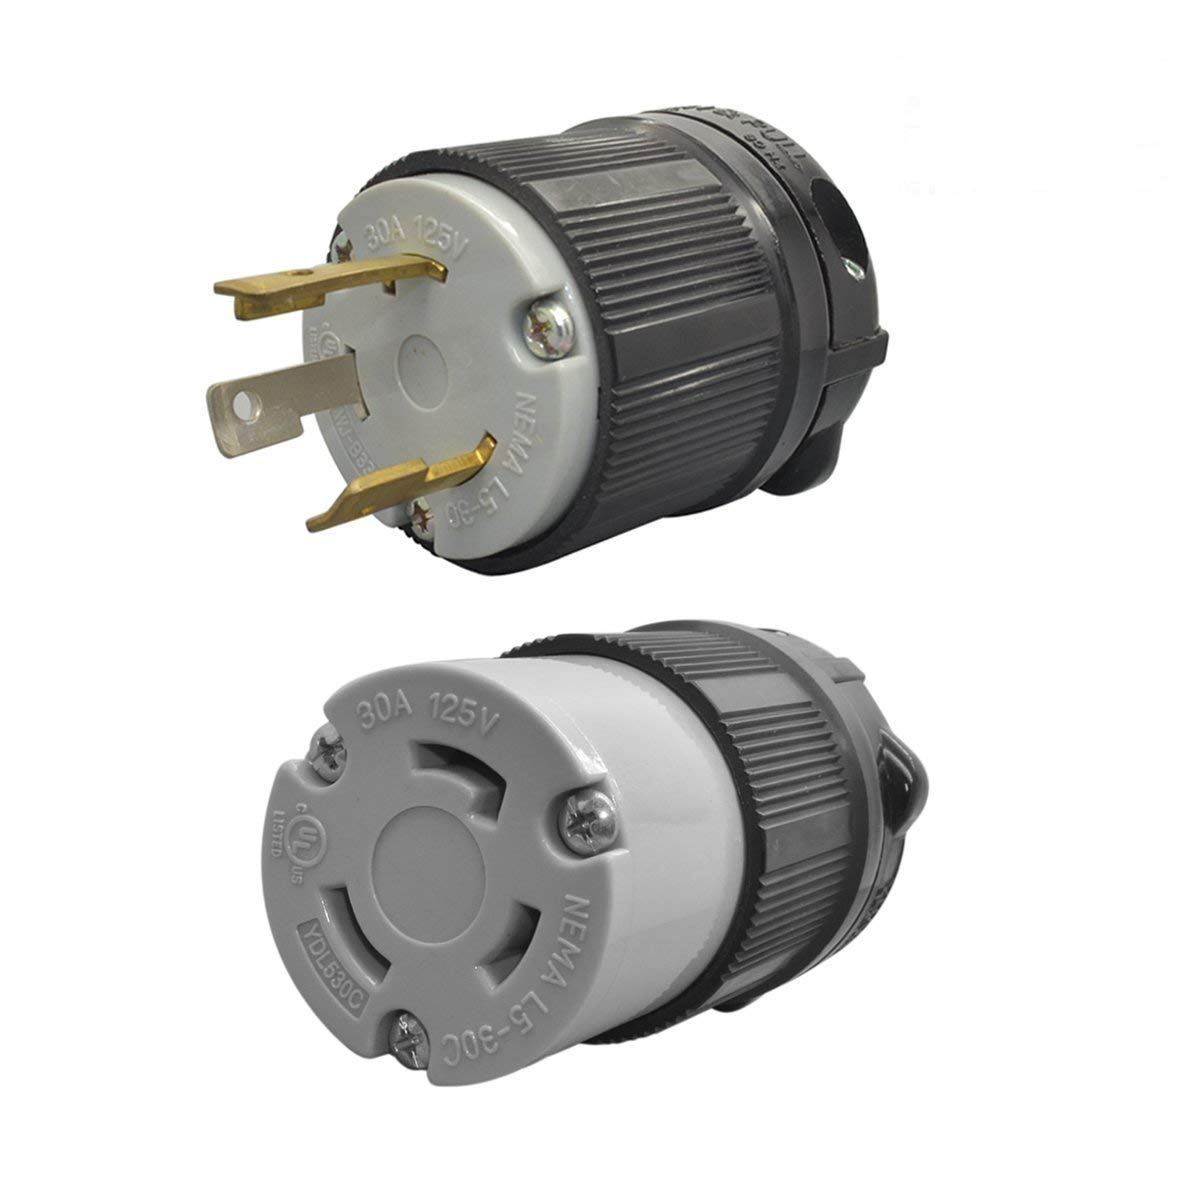 YuaDon UL Listed 125 Volt,30 Amp,NEMA L5-30 Sets, NEMA L5-30R, NEMA L5-30P,Locking Plug Receptacle,Grounding,2 Poles,3 Wires,Industrial Grade